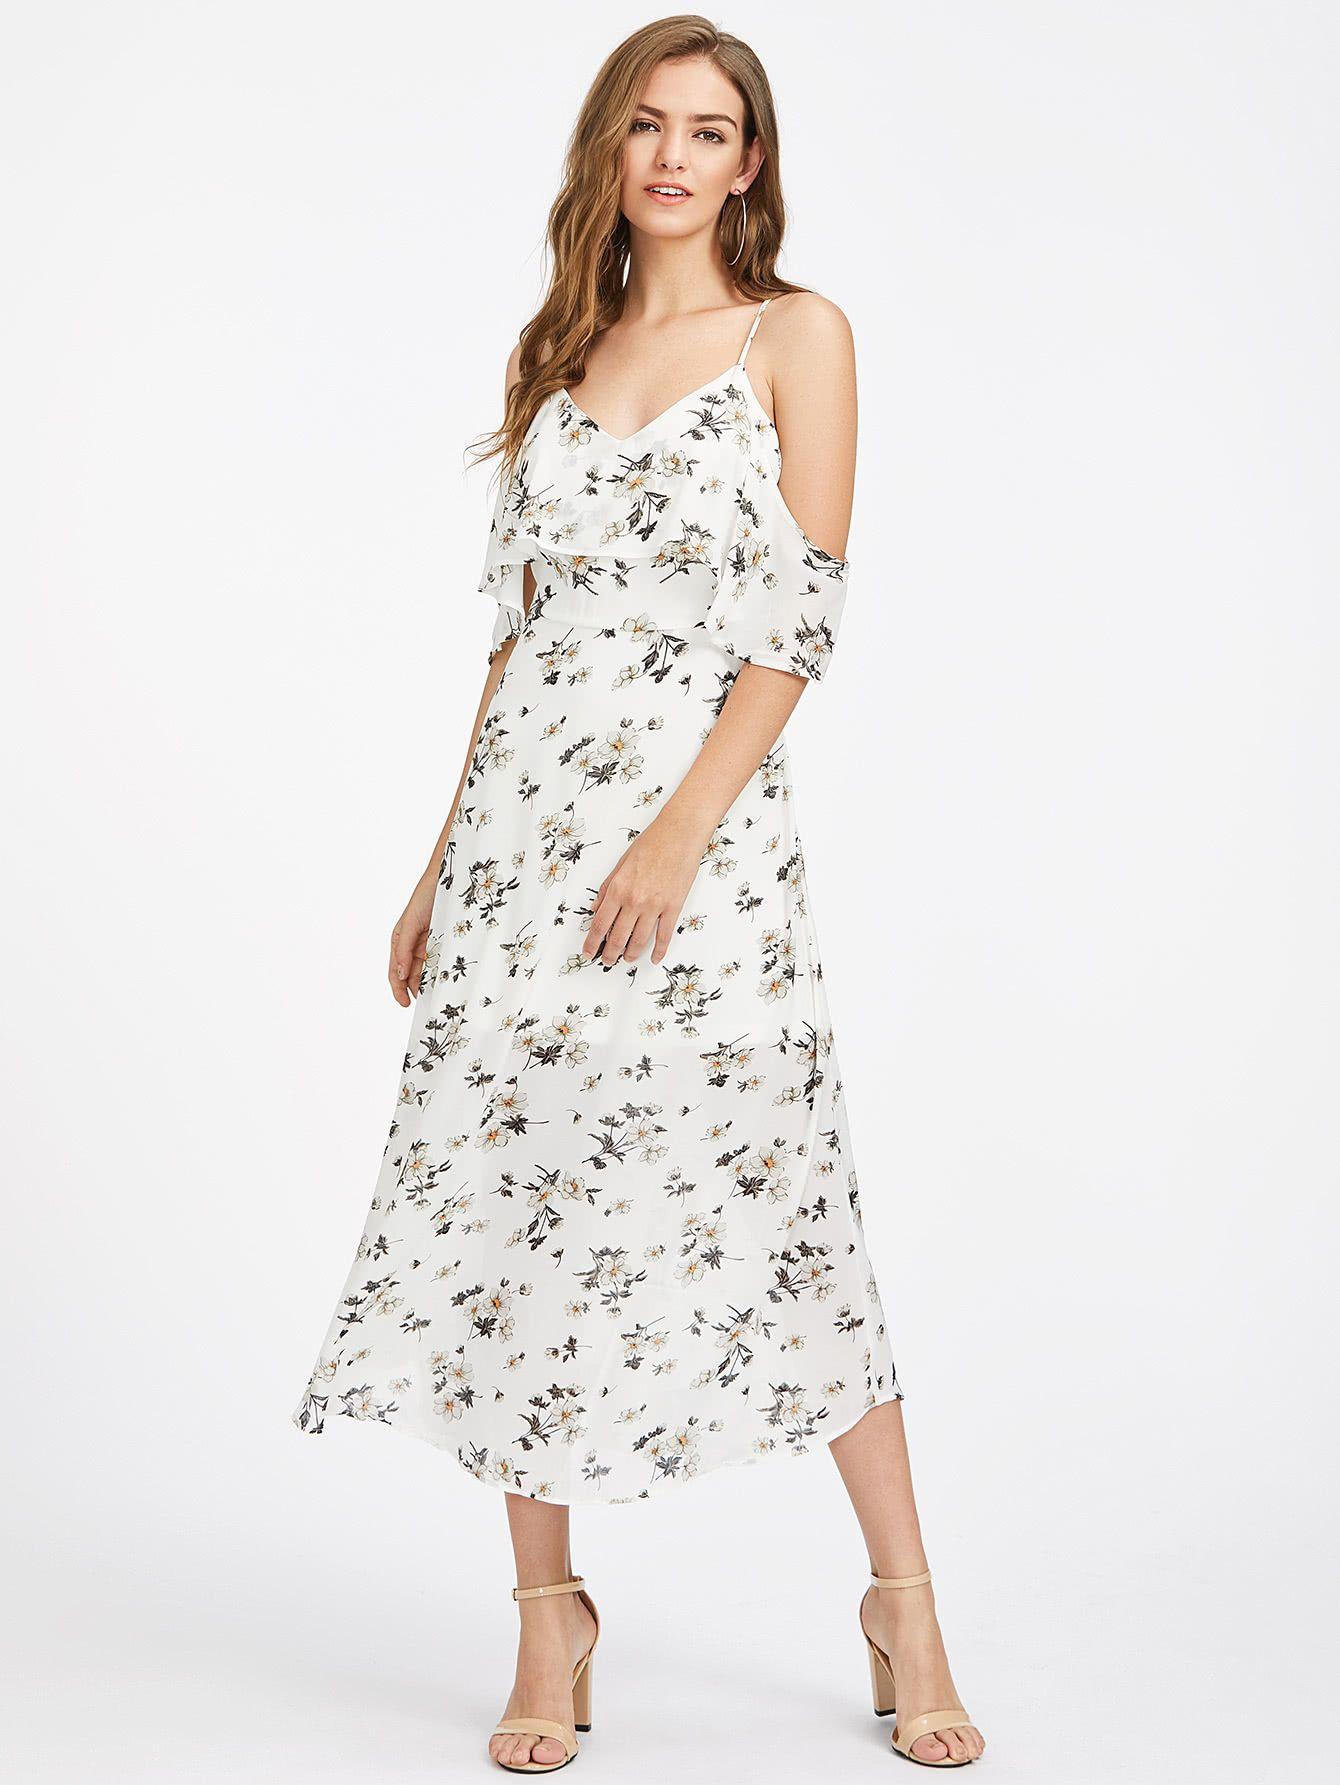 a85ff83498476 ¡Consigue este tipo de vestido informal de SheIn ahora! Haz clic para ver  los detalles. Envíos gratis a toda España. Calico Print Flounce Layered  Dress  ...